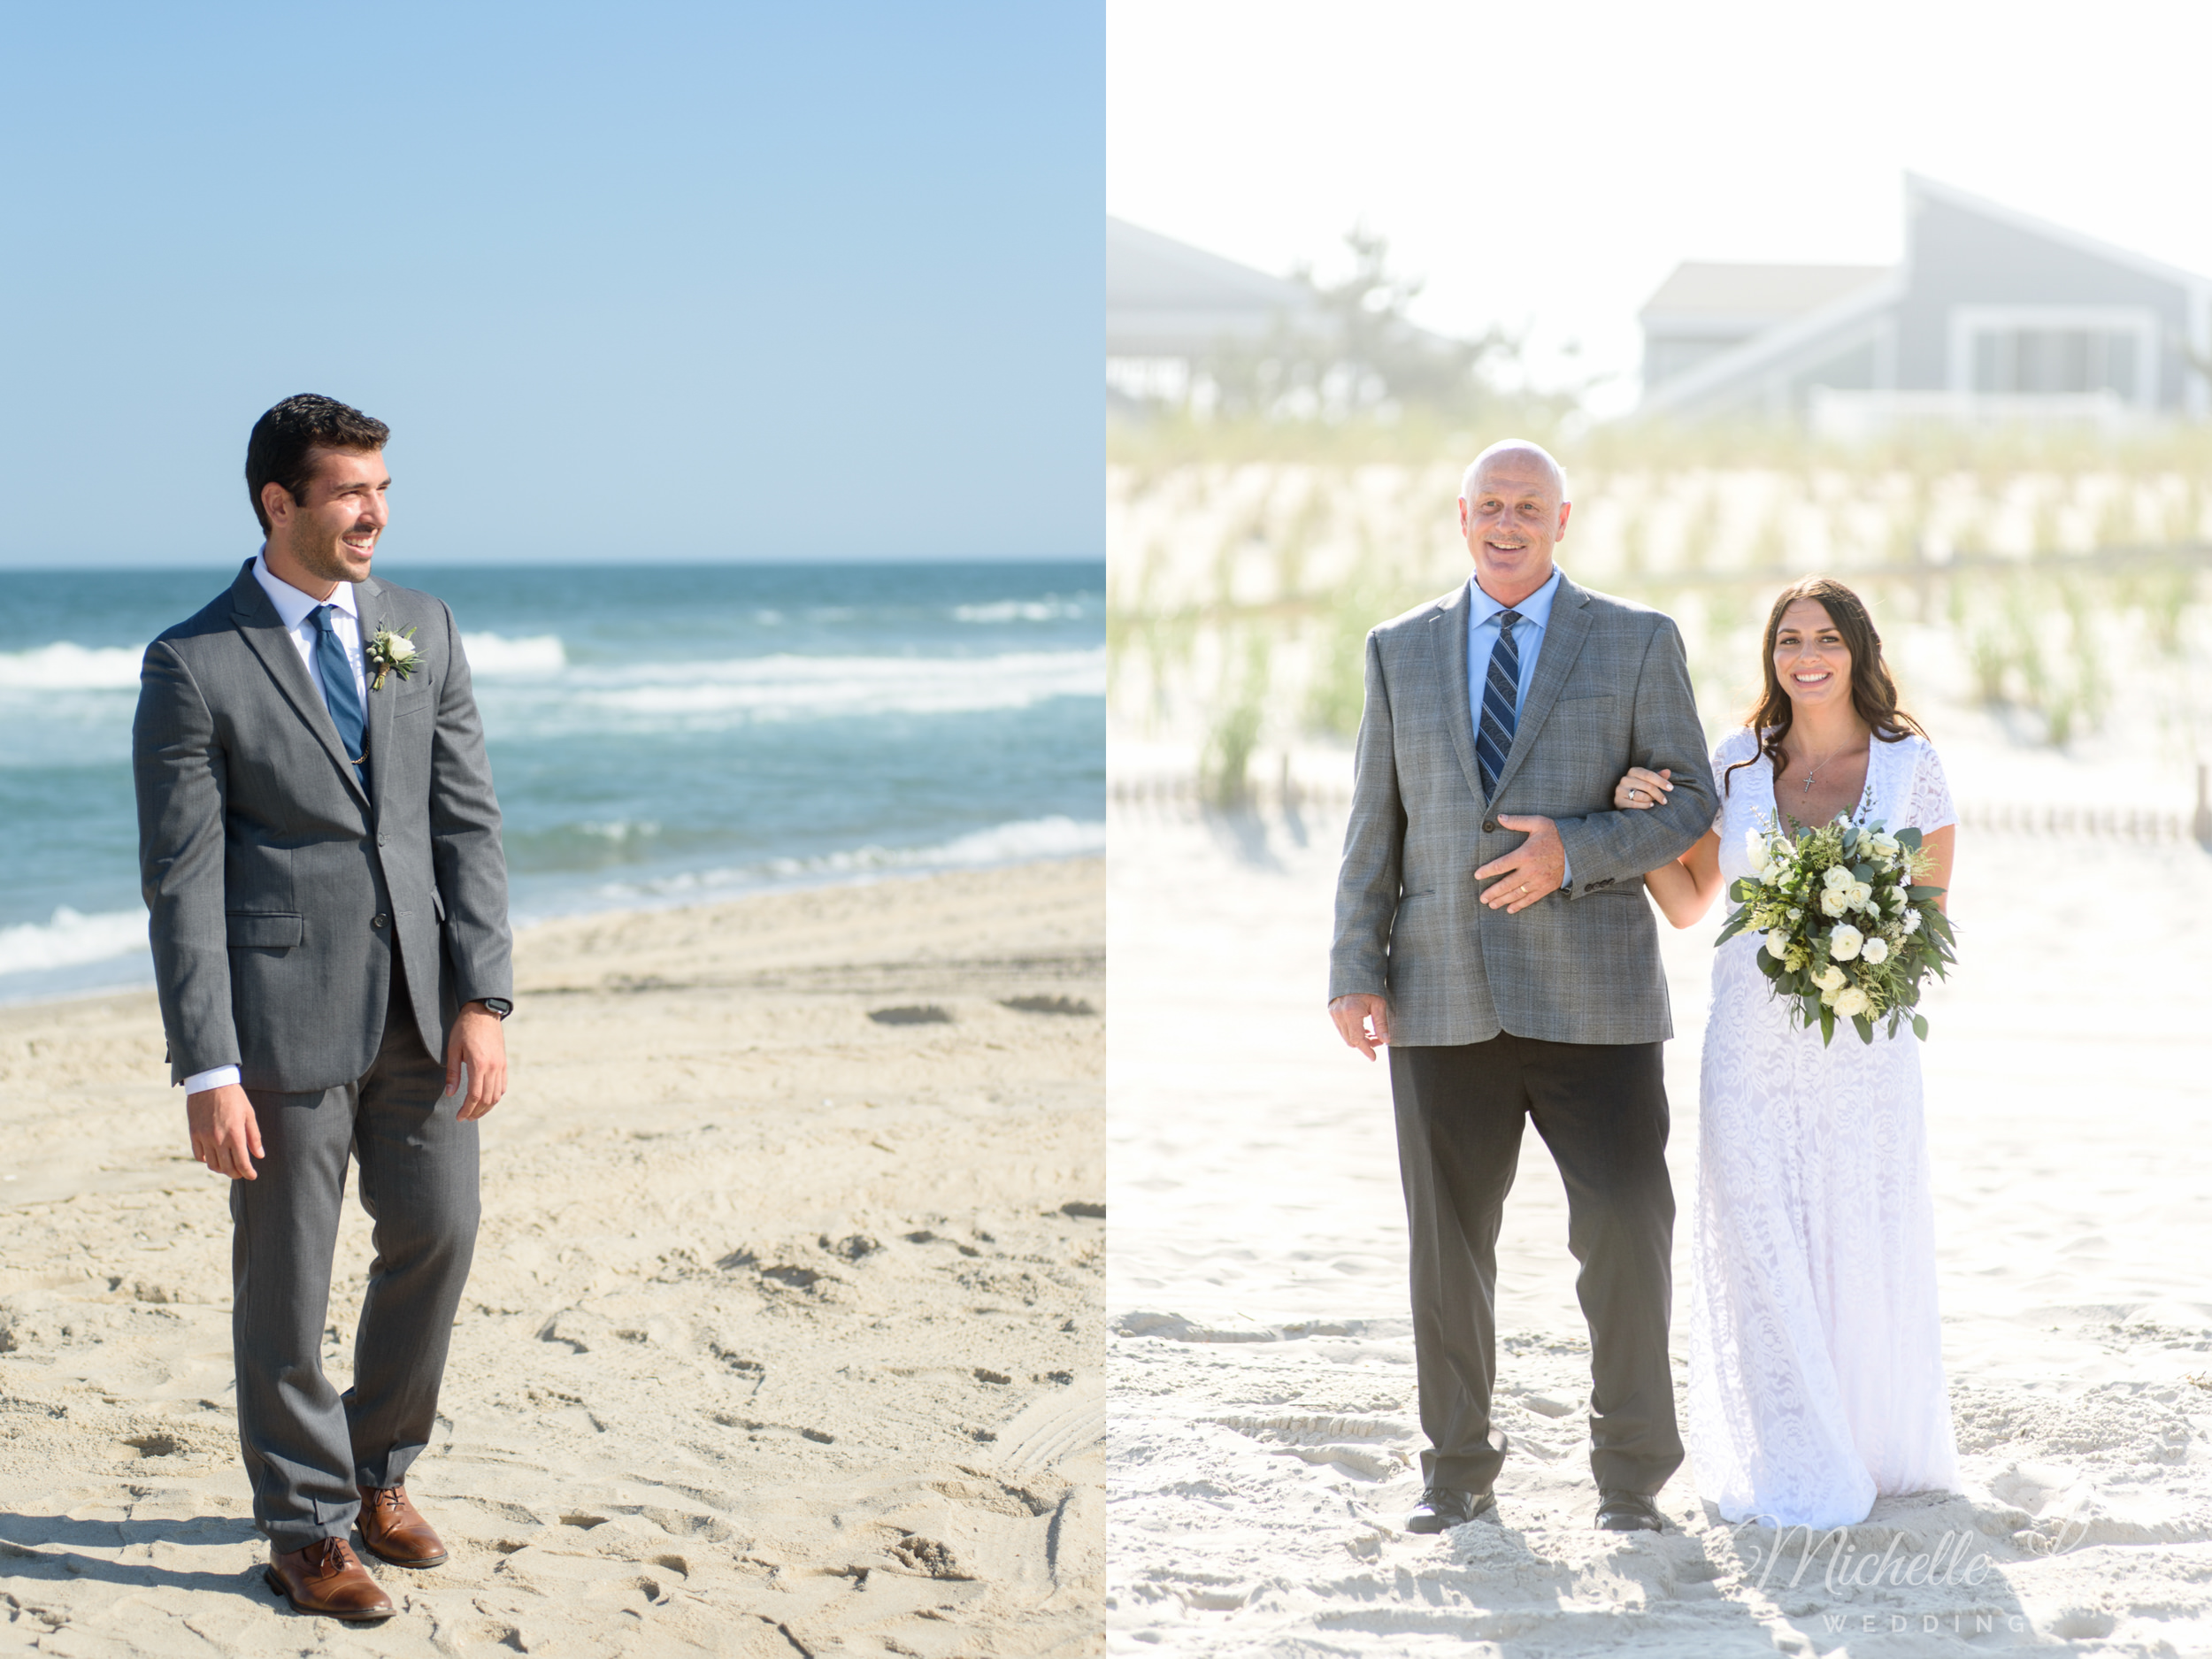 mlw-brant-beach-lbi-wedding-photography-12.jpg